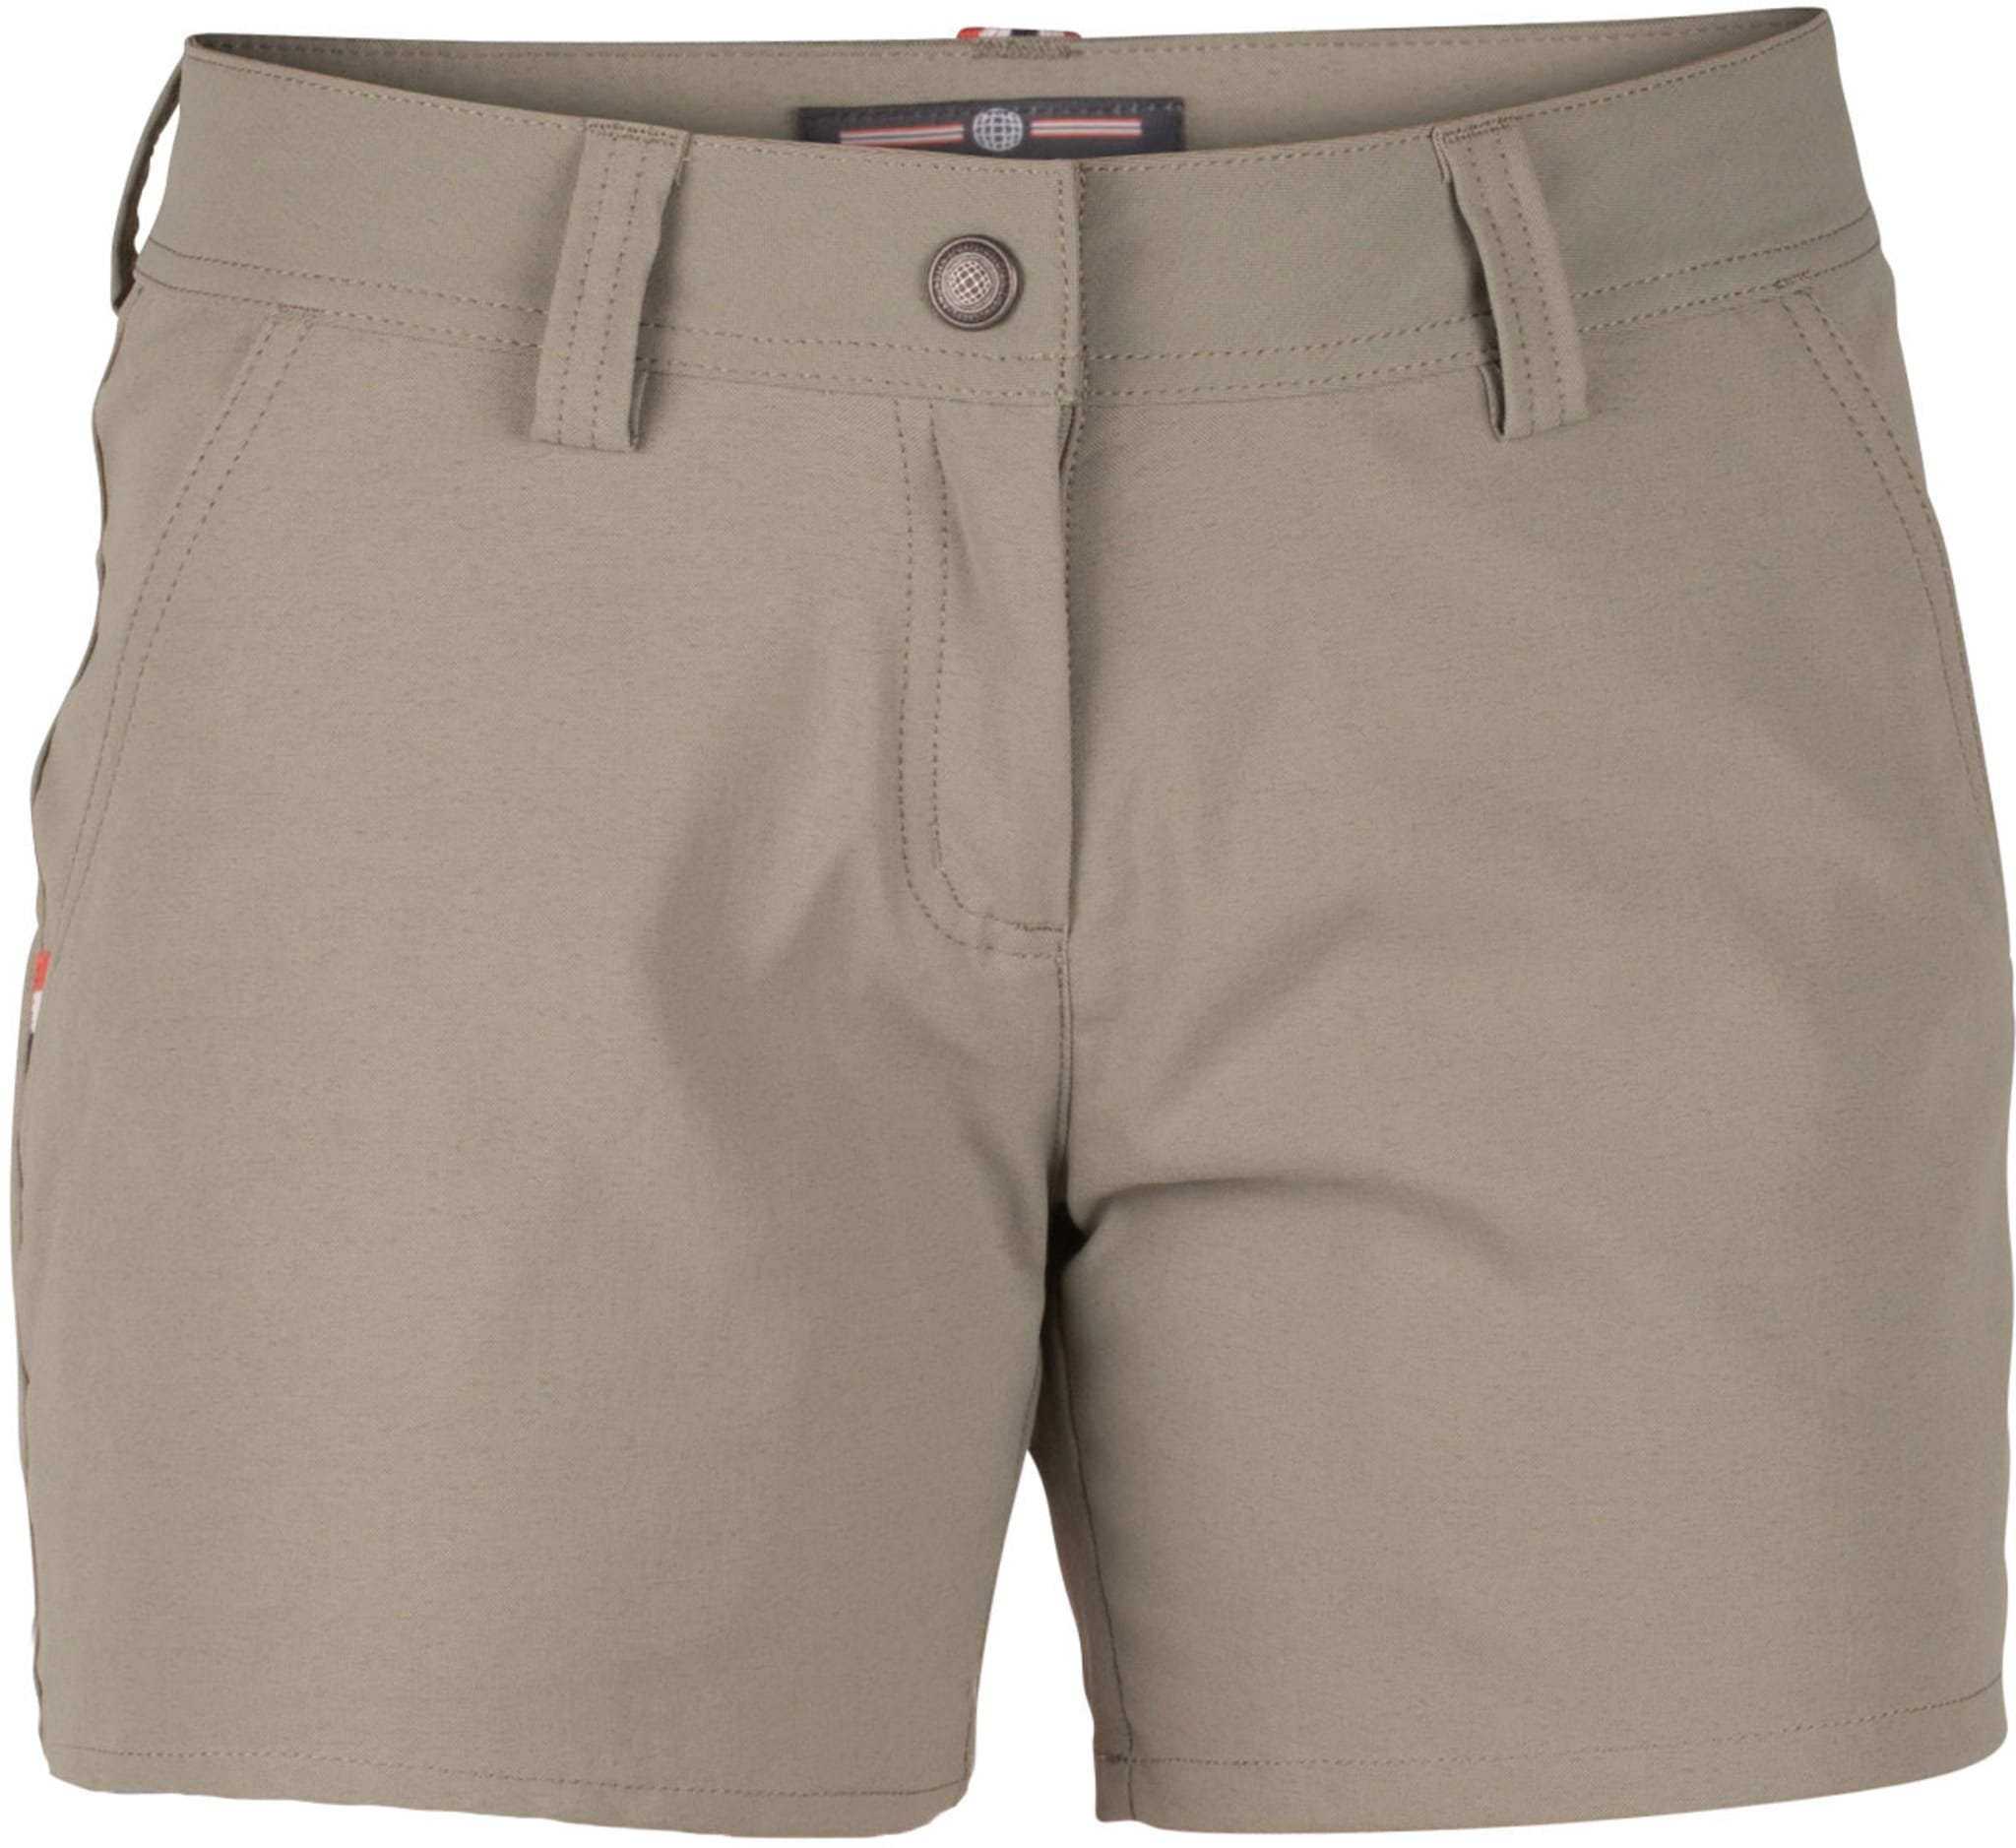 6incher Deck Shorts W